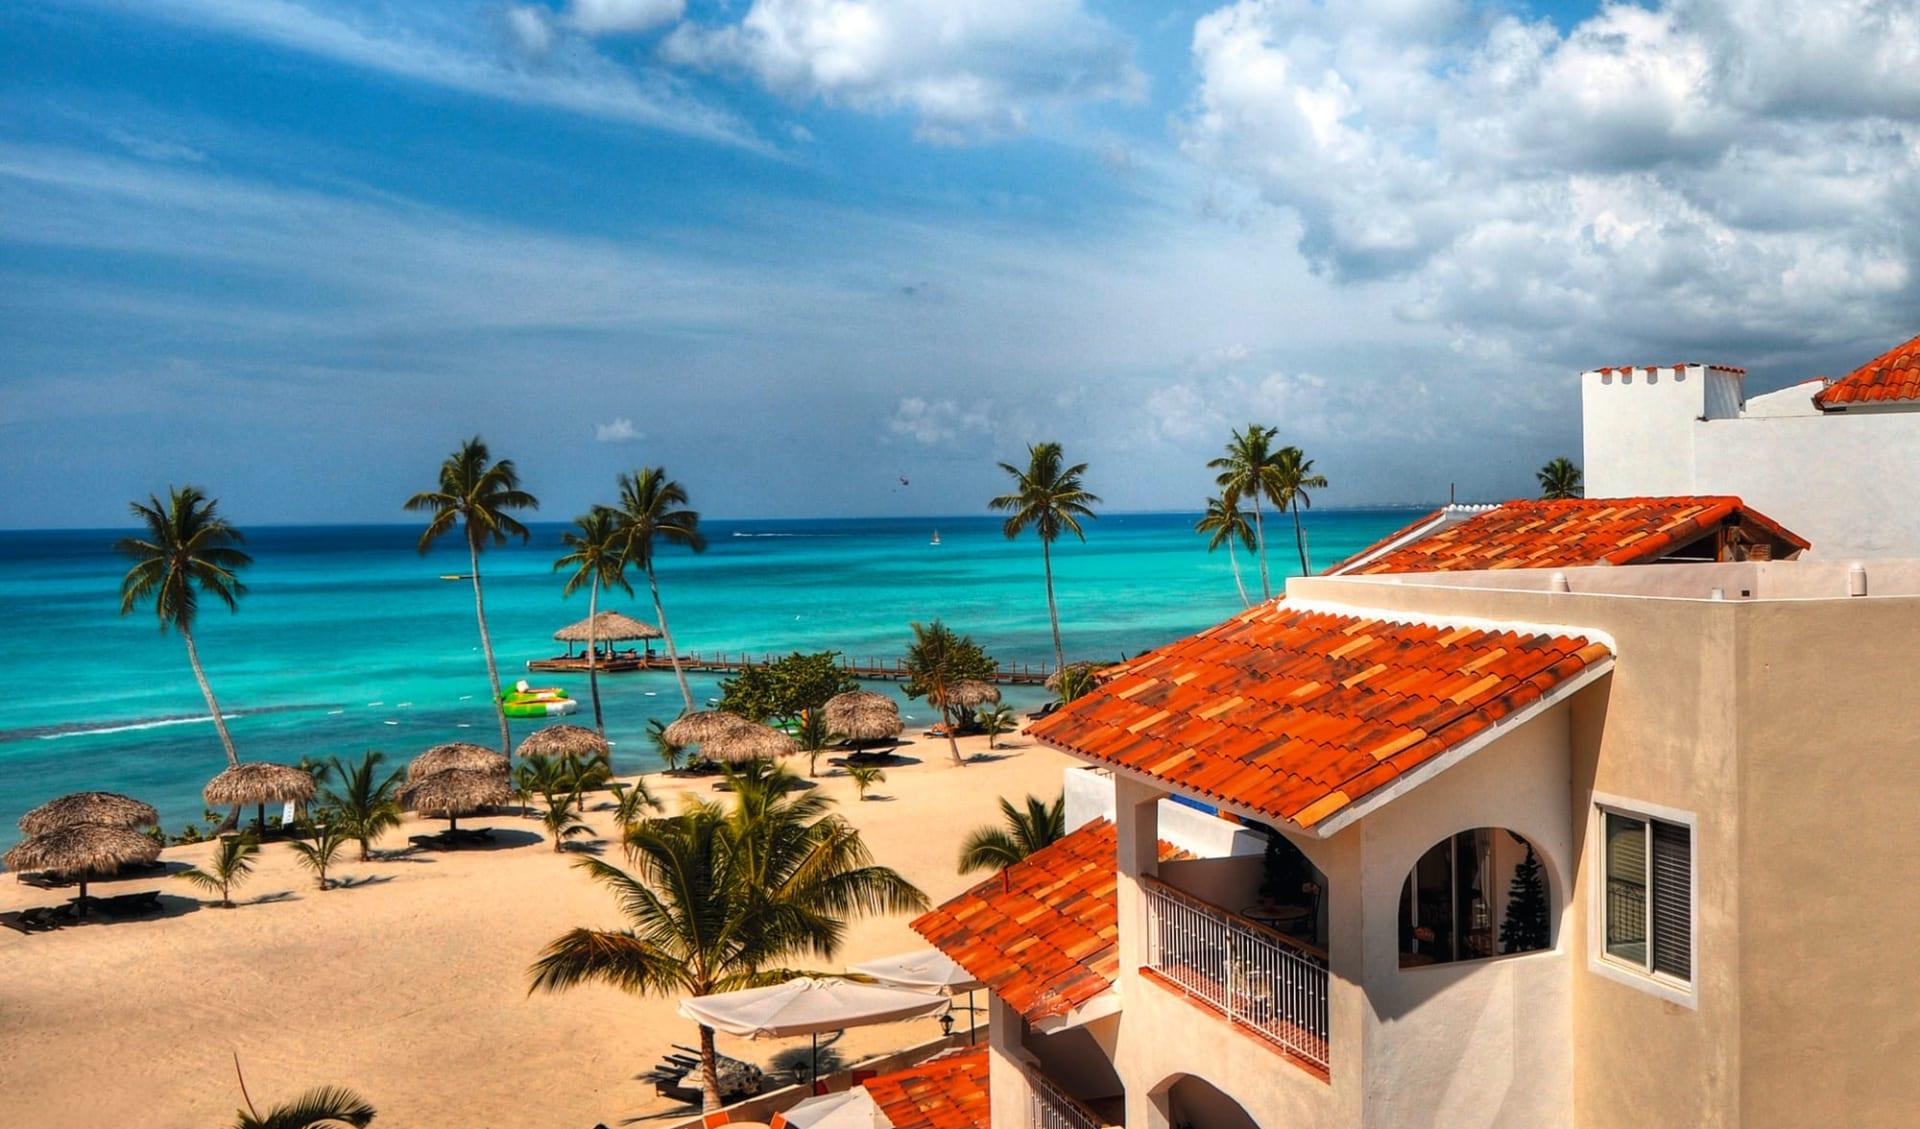 Cadaques Caribe Resort in Bayahibe: natur cadaques caribe resort strand meer hotel